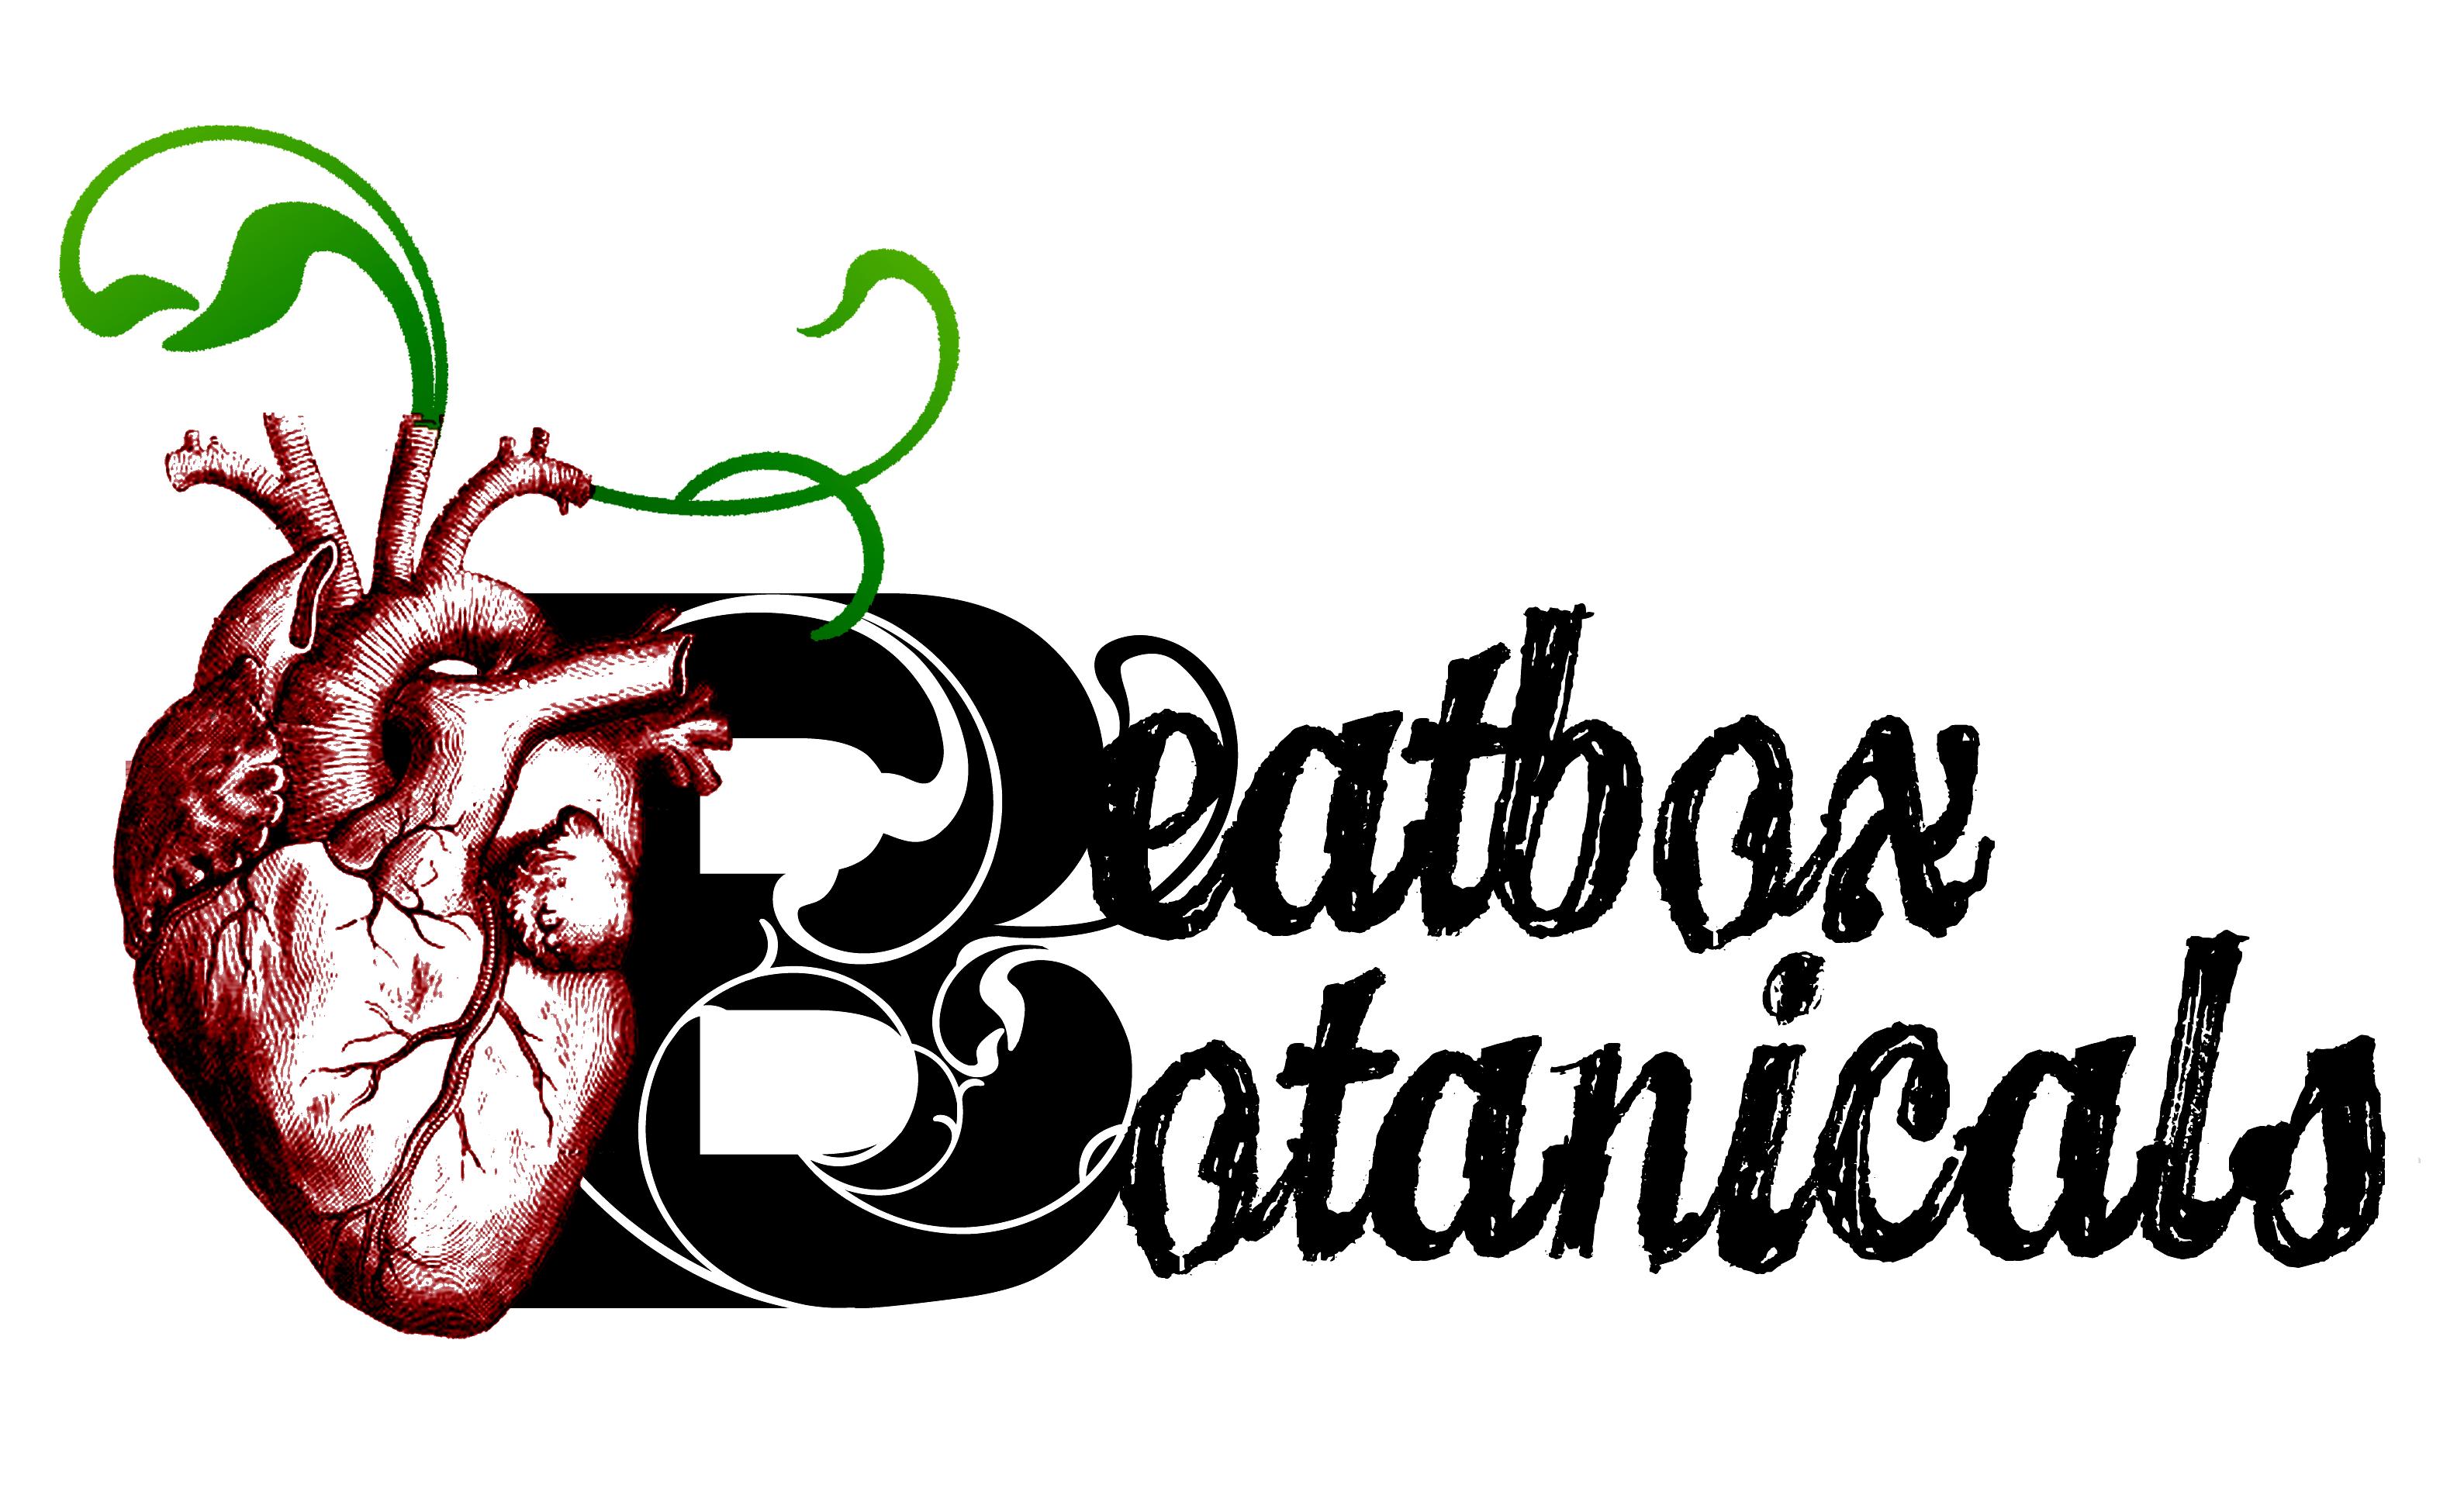 beatbox botanicals logo